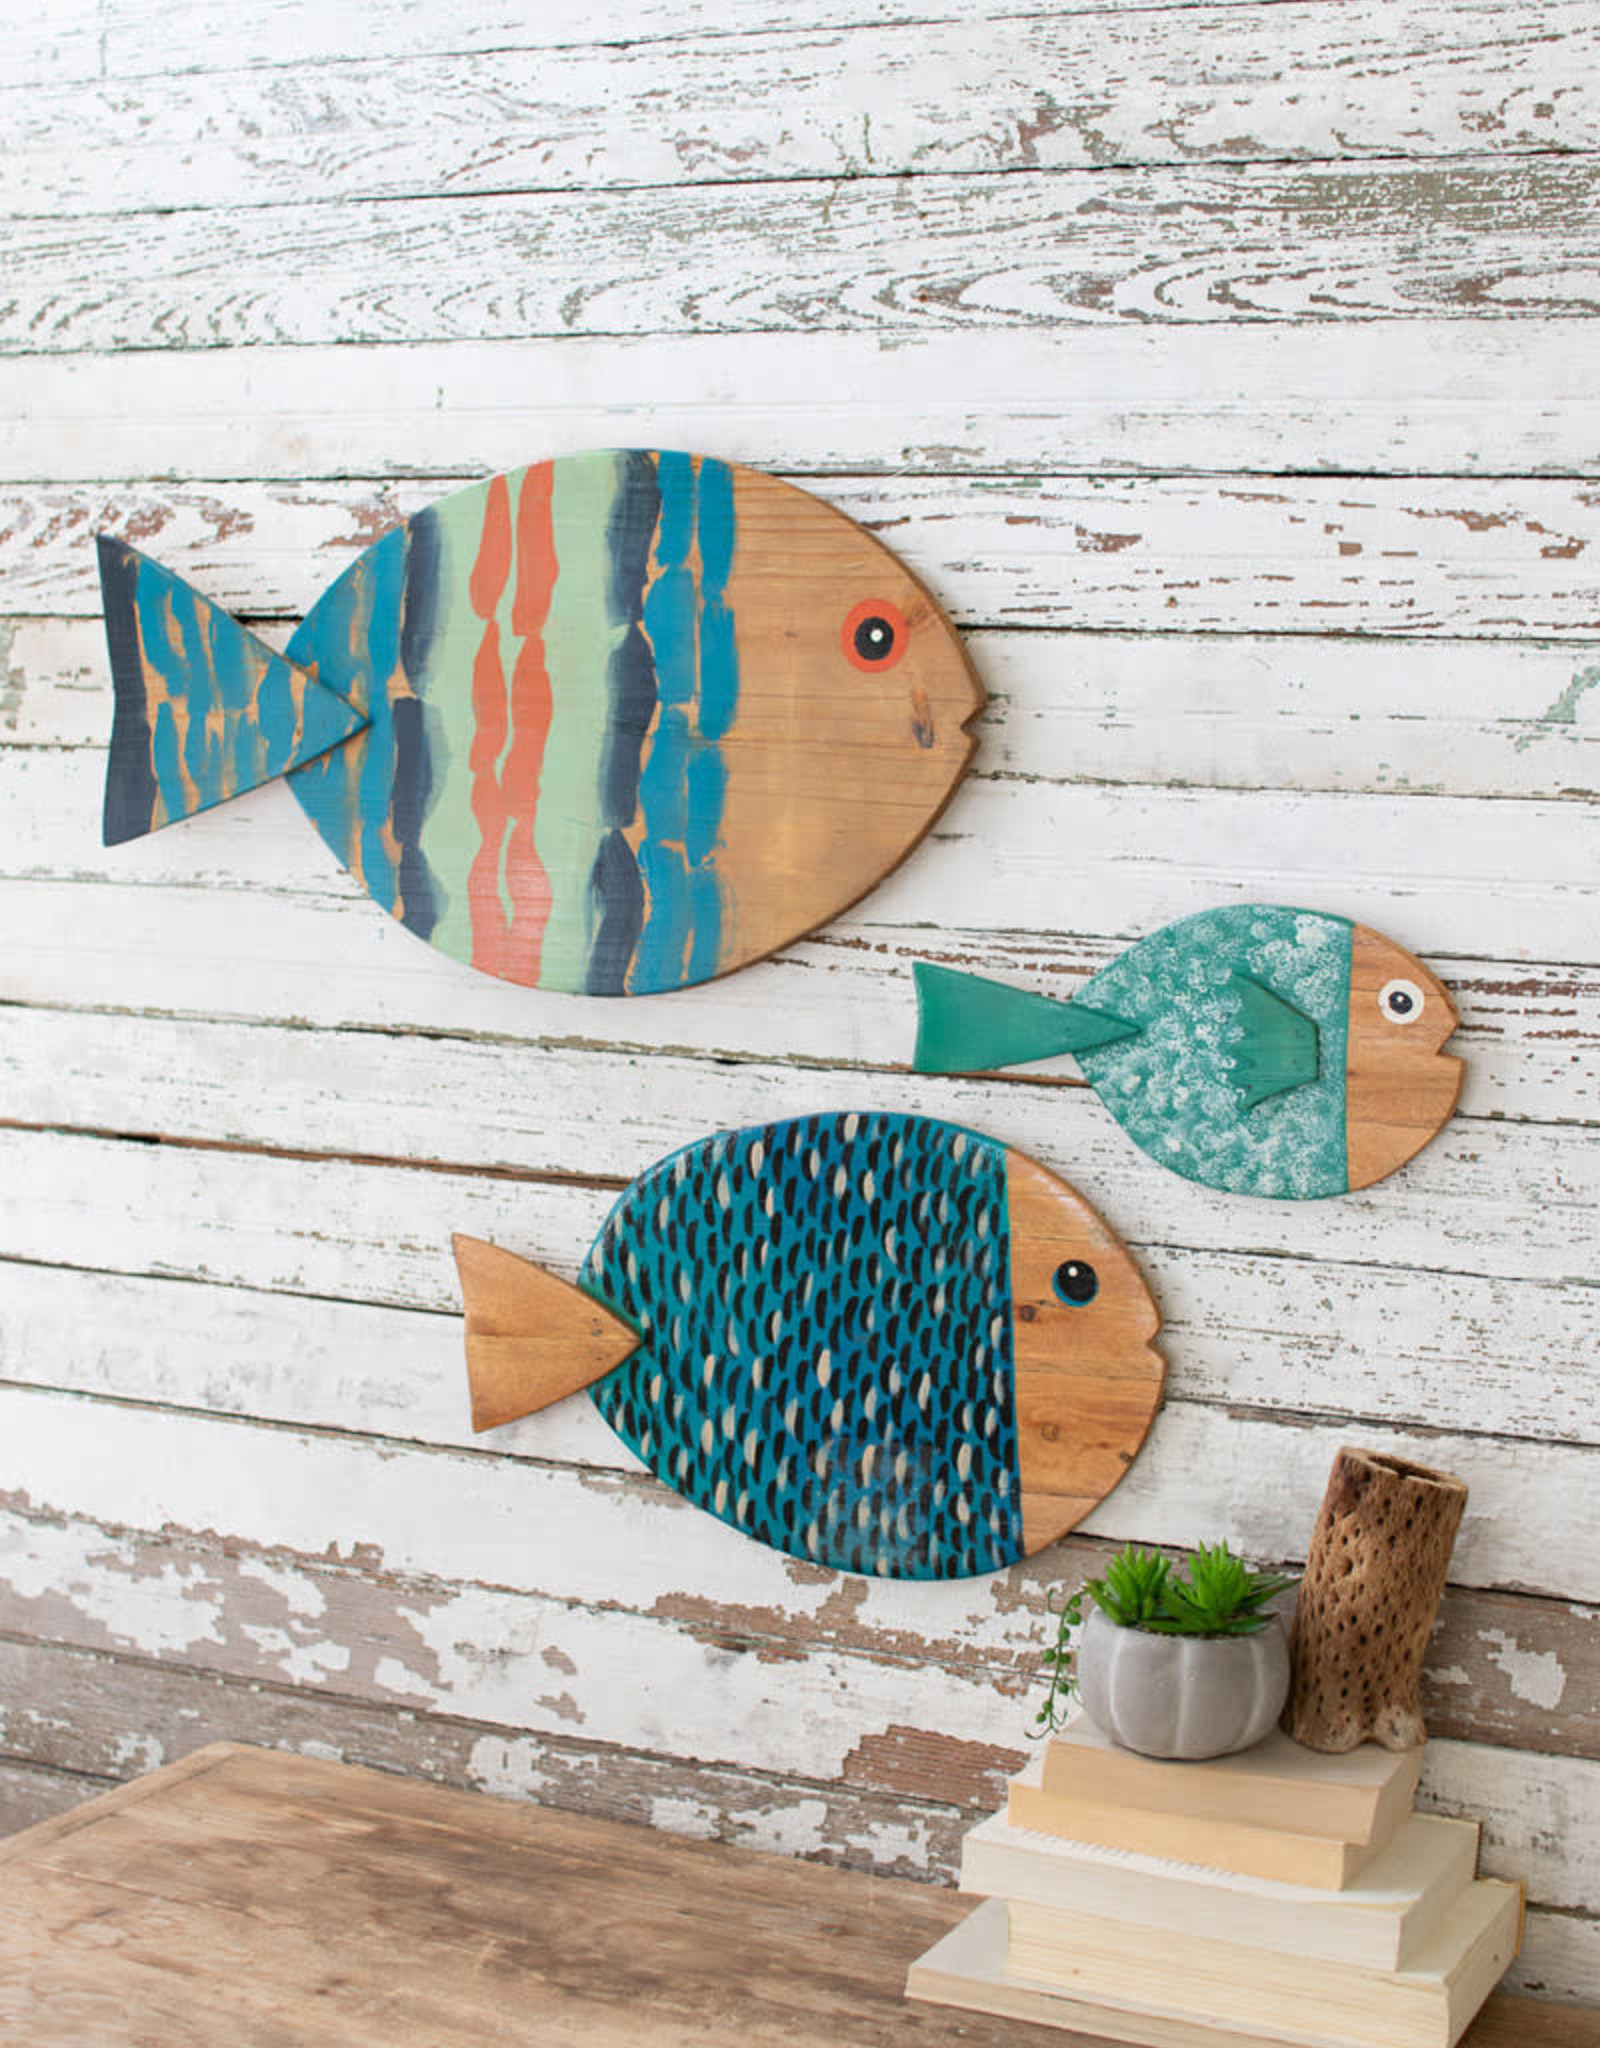 Kalalou Set of 3 Painted Wooden Fish Wall Hangings